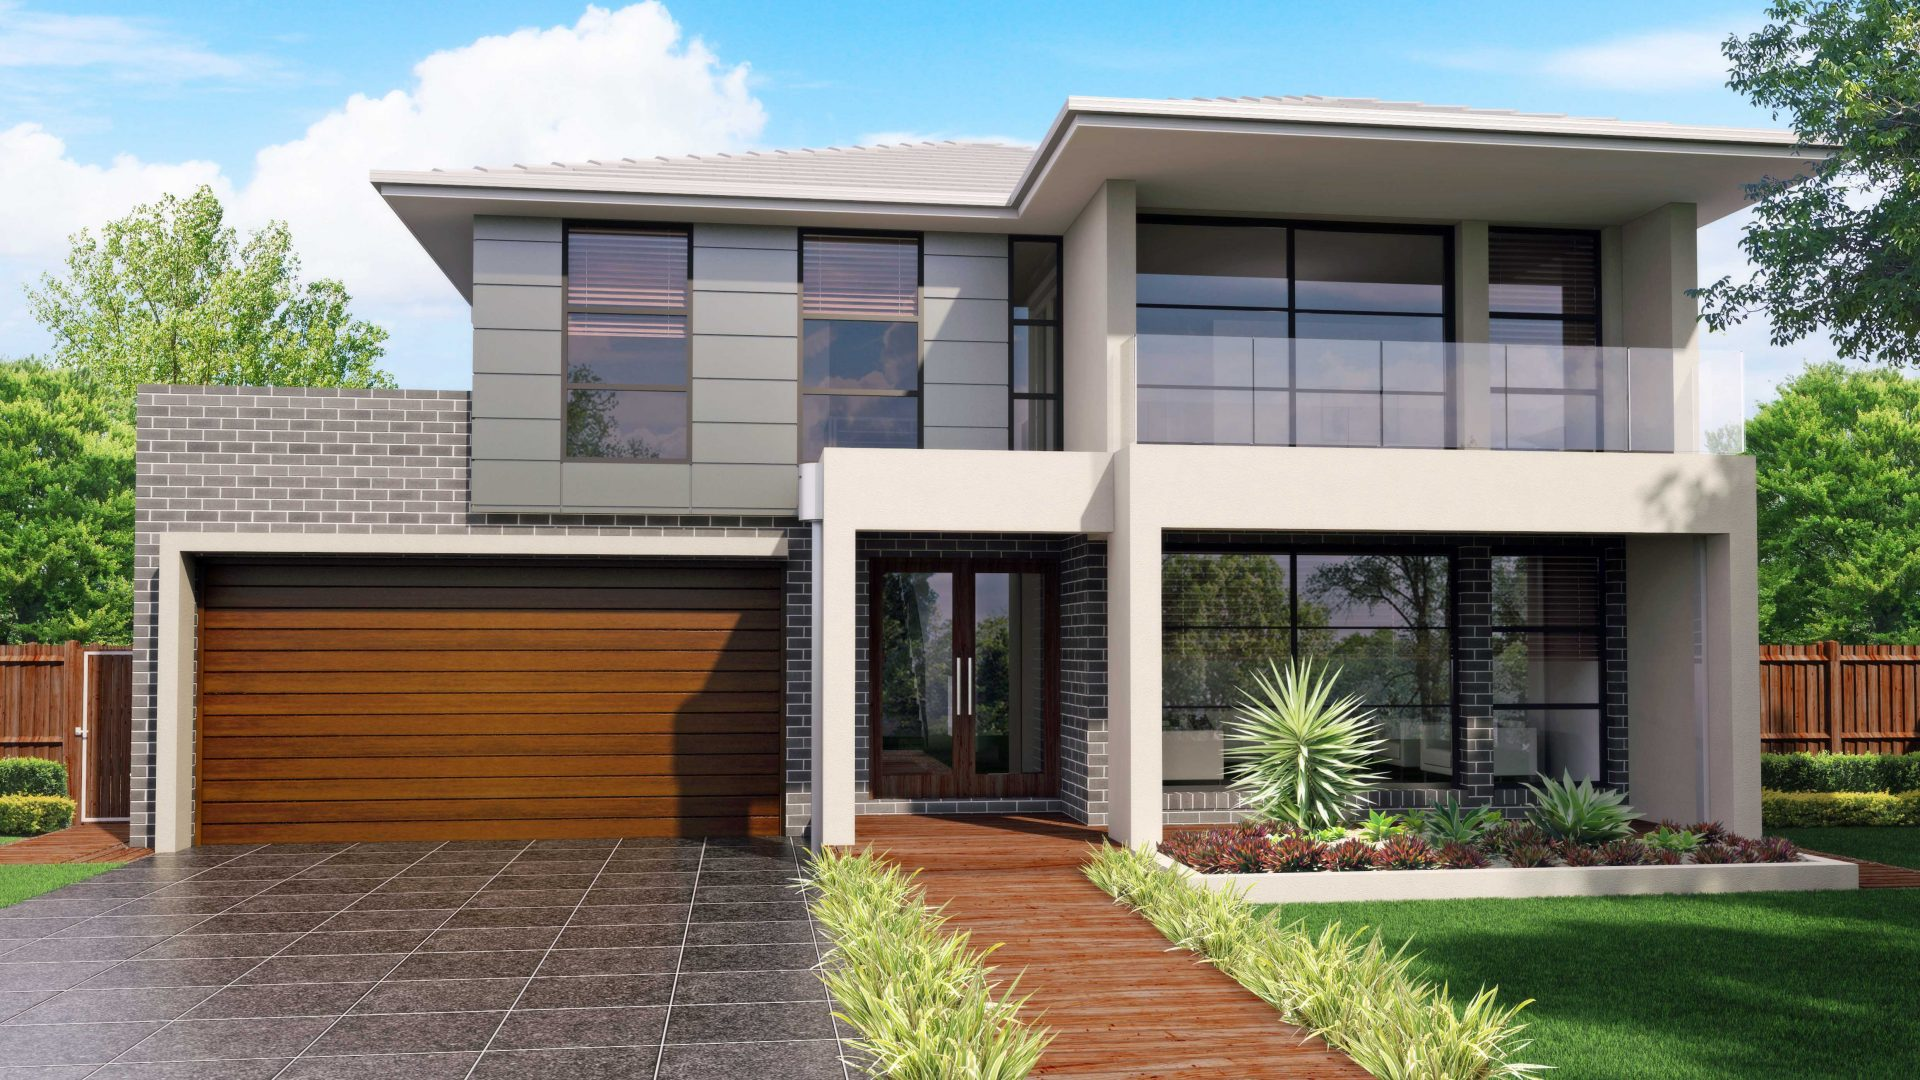 Australis 34, Modern Façade with Balcony - Jandson Homes